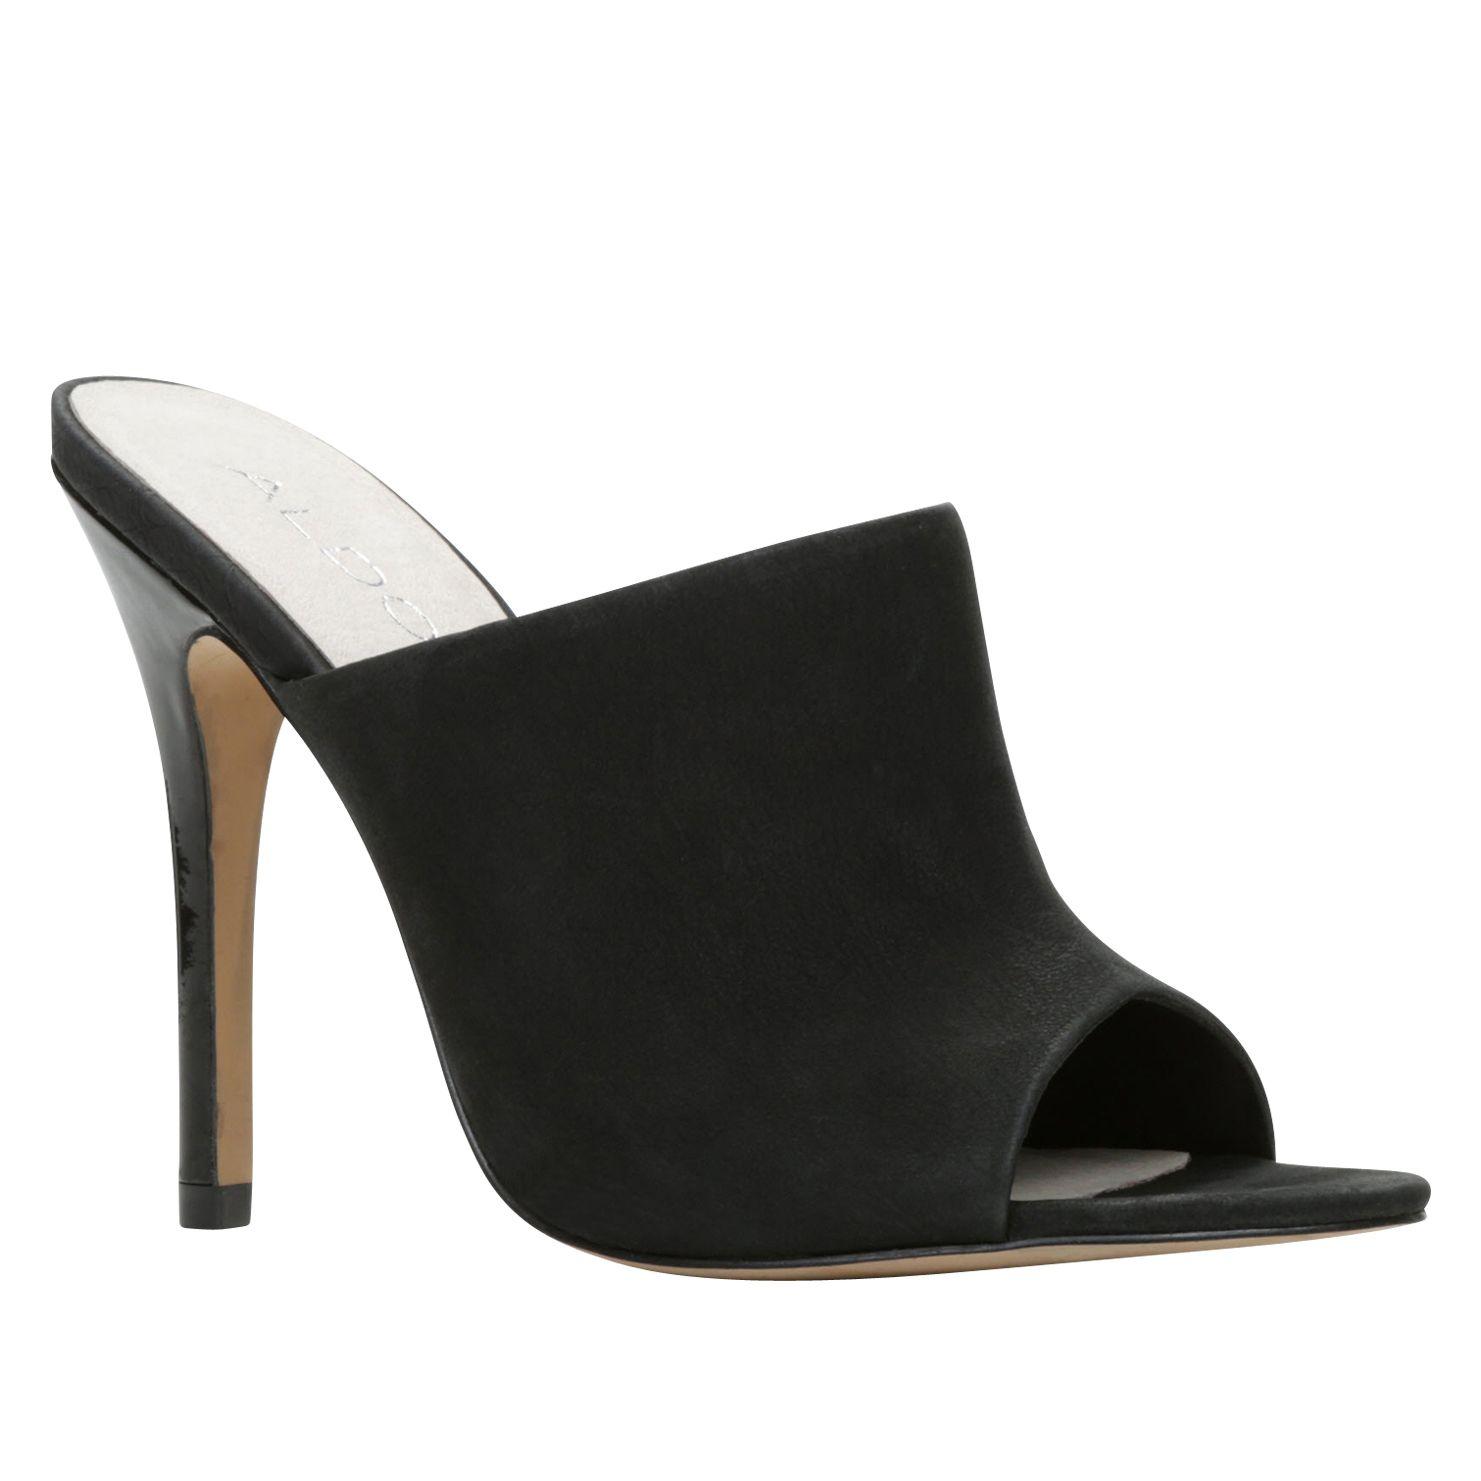 aldo hamaliel peep toe high heel sandals in black lyst